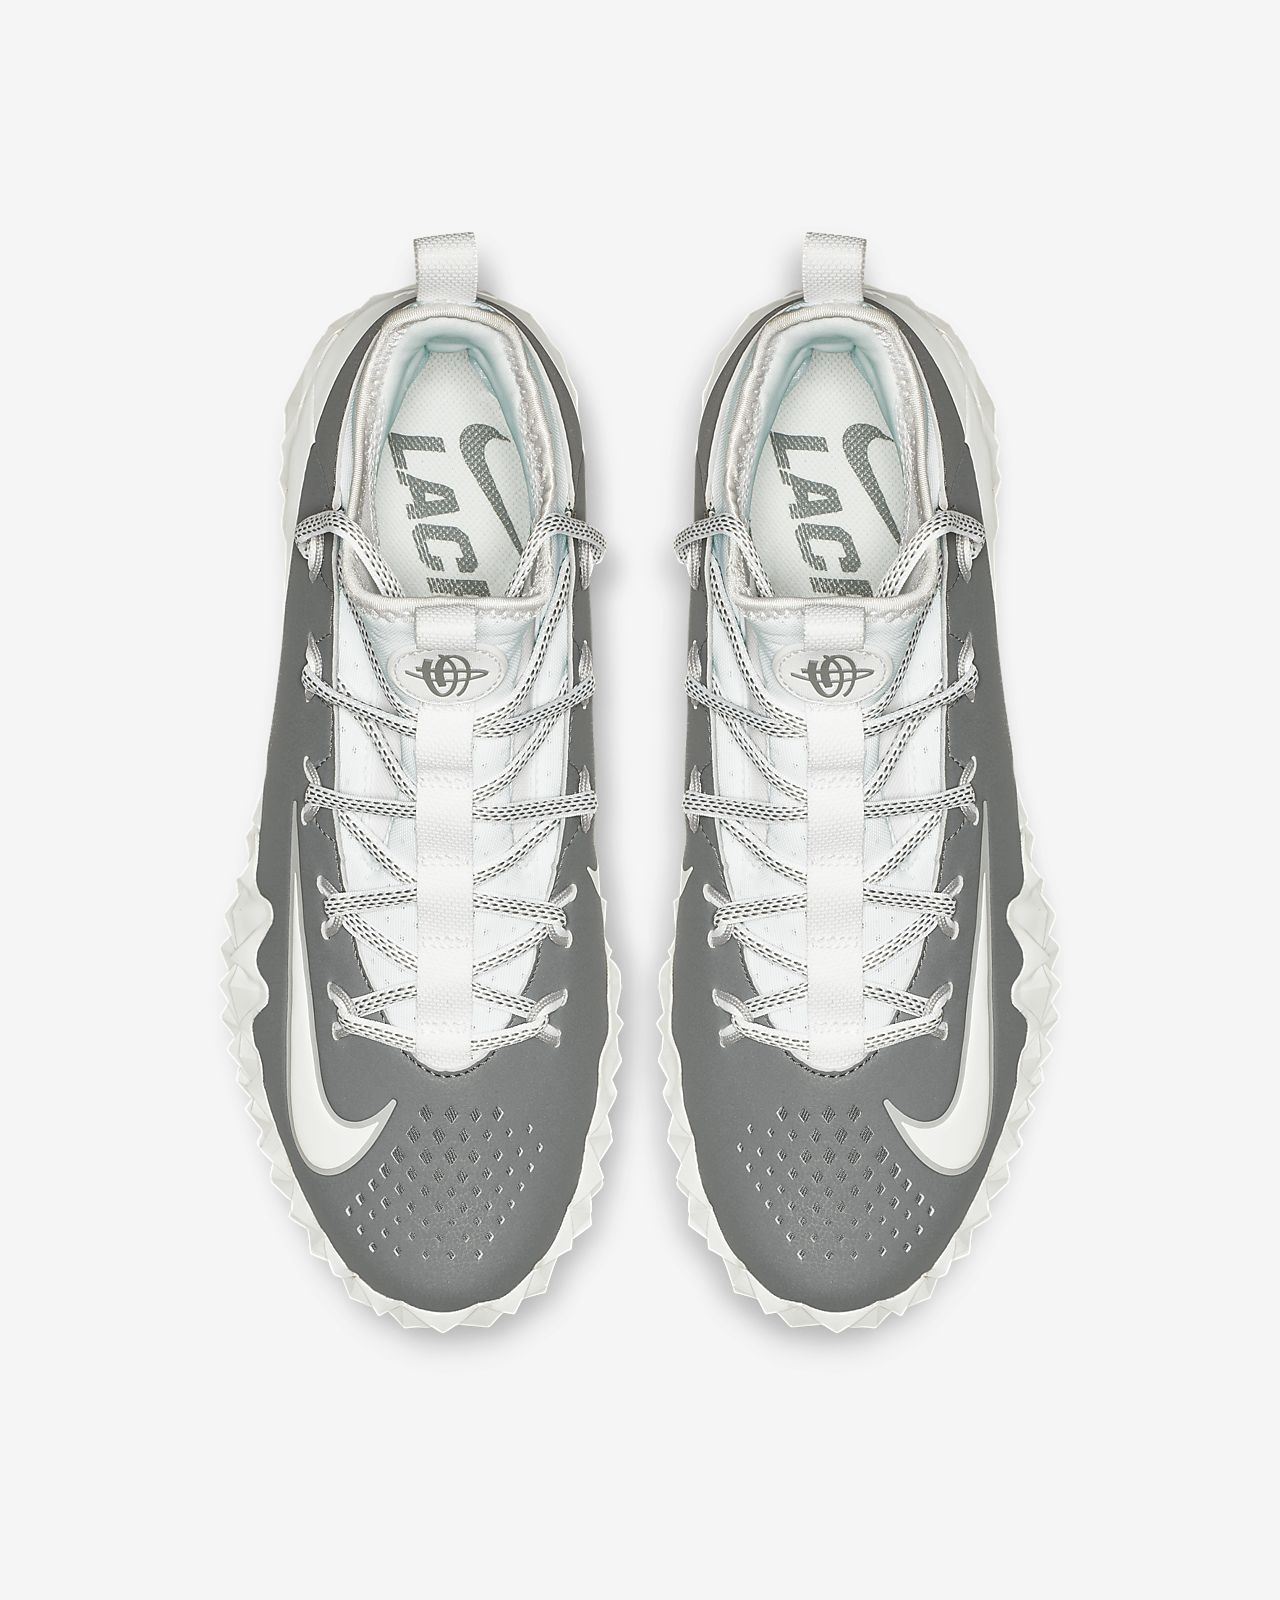 2b60fa68cdd3 Nike Alpha Huarache 6 Elite Turf LAX Lacrosse Cleat. Nike.com